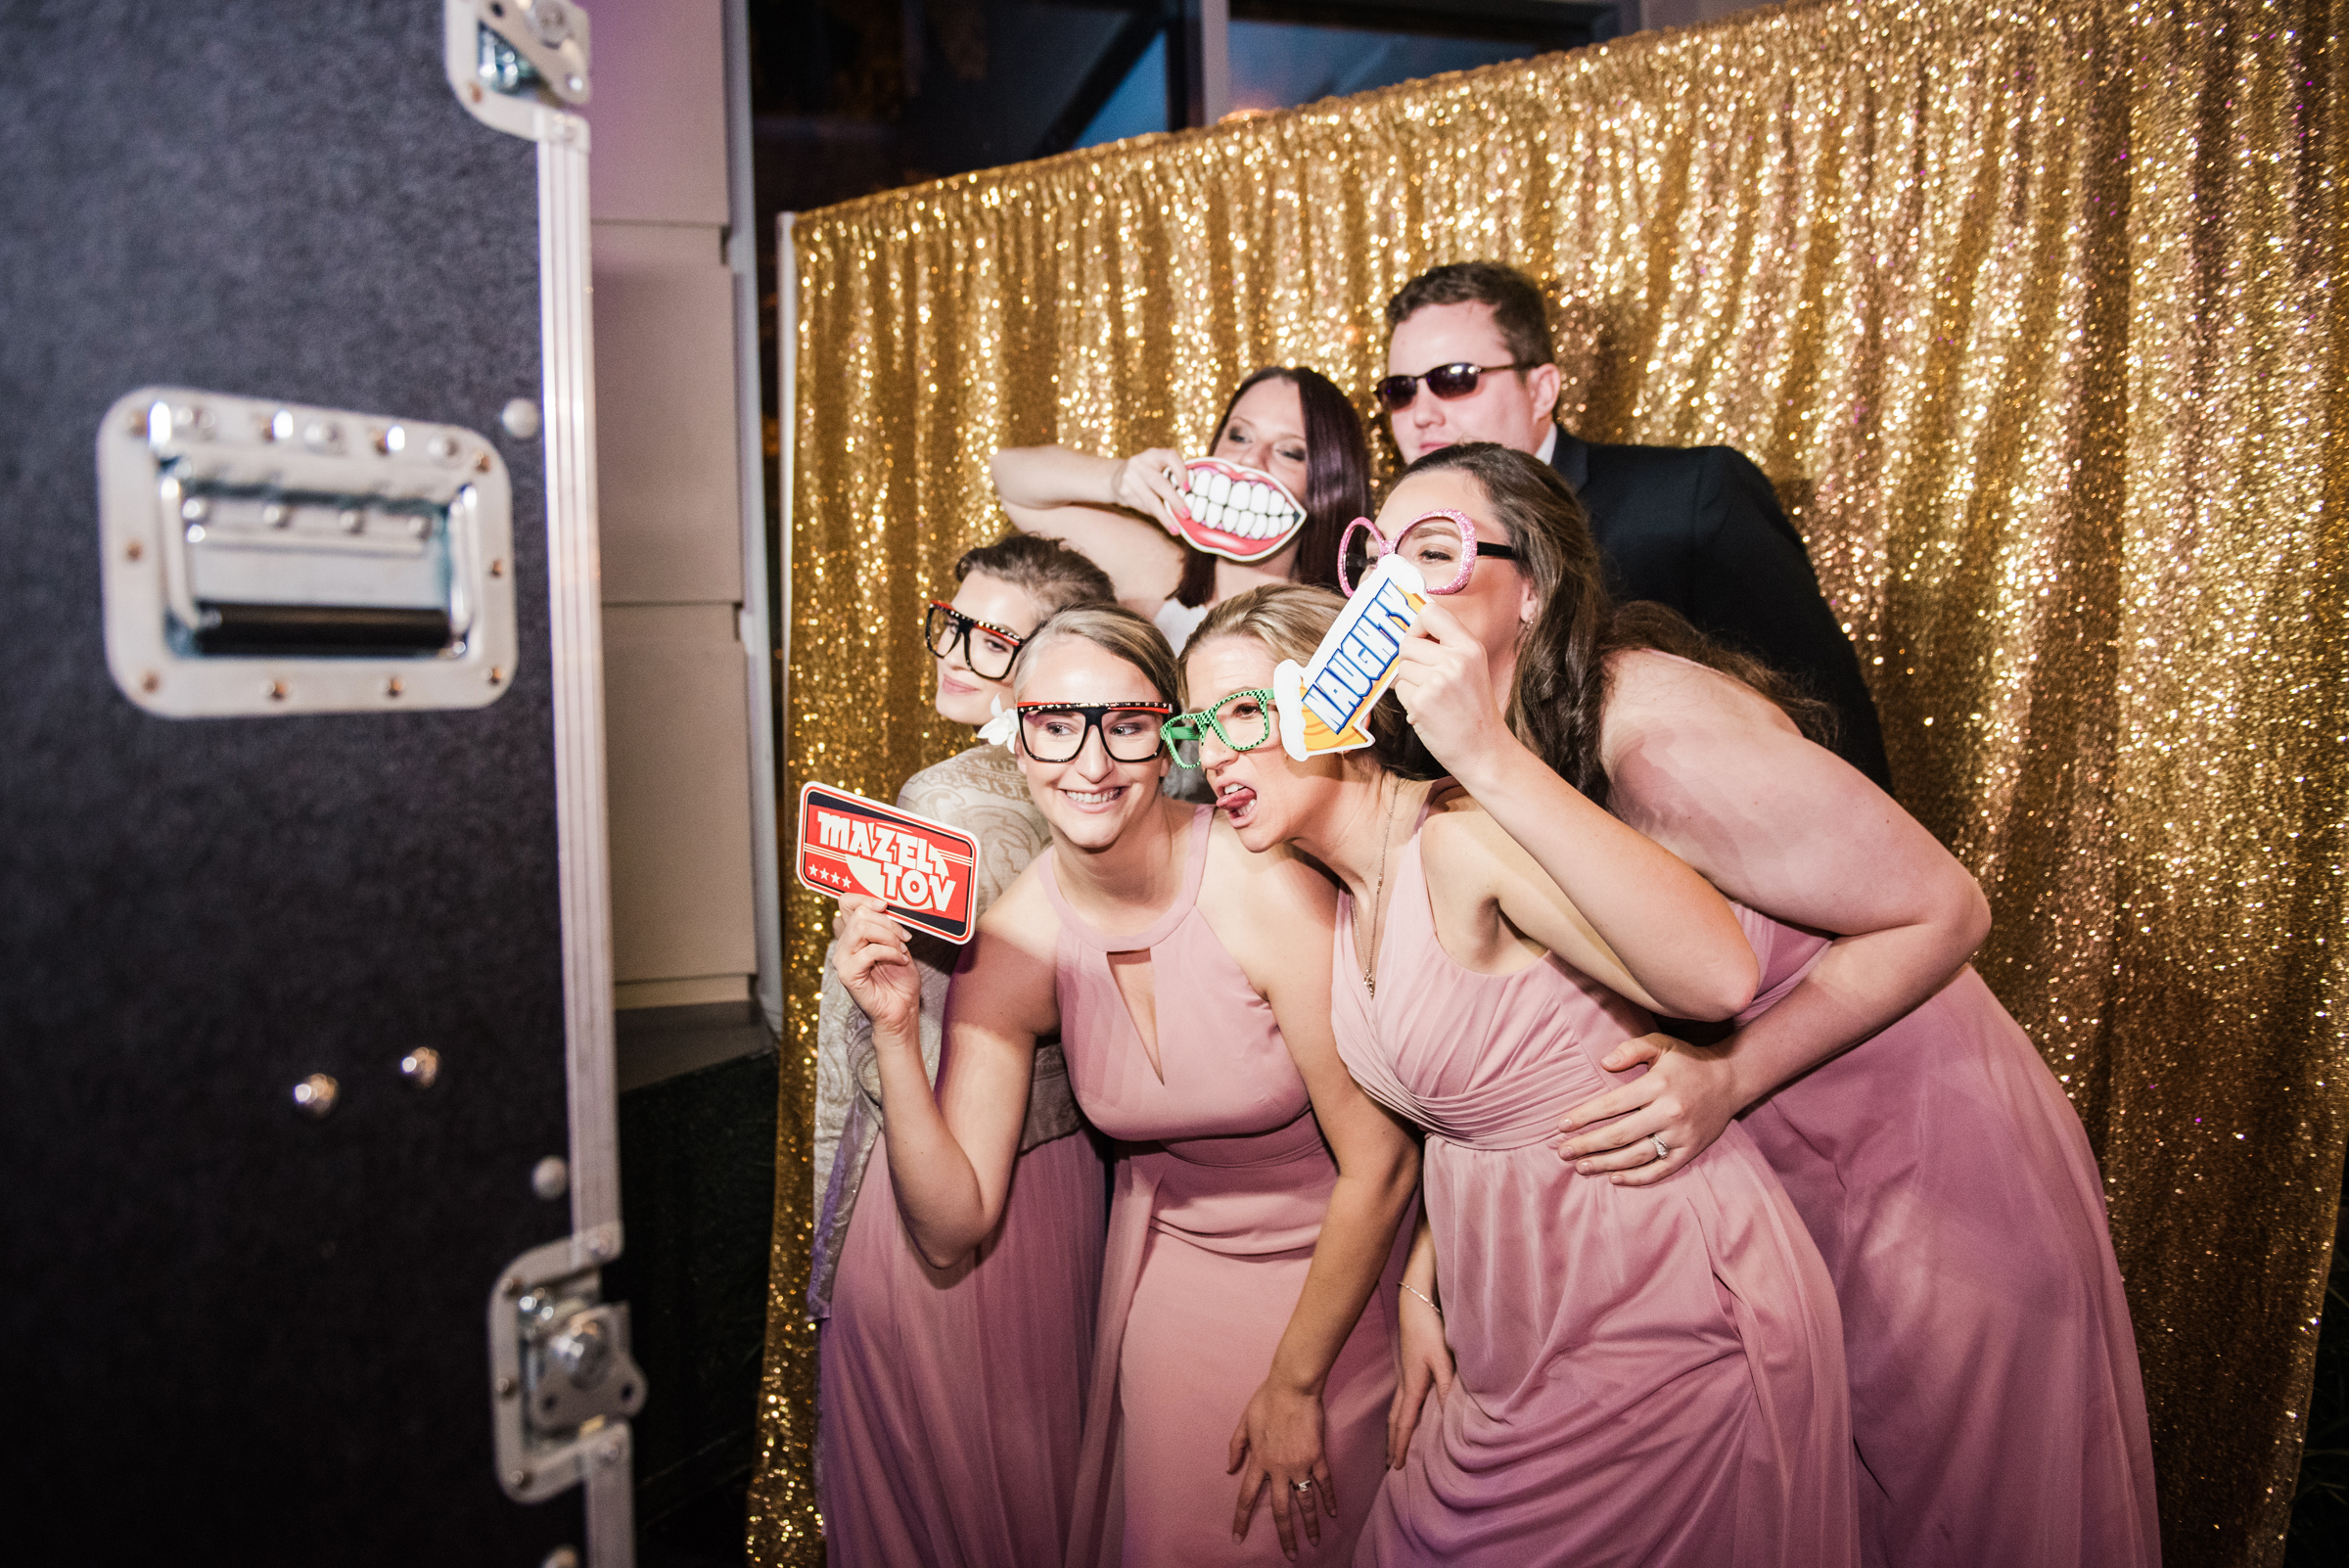 Wintergarden_by_Monroes_Rochester_Wedding_JILL_STUDIO_Rochester_NY_Photographer_213225.jpg